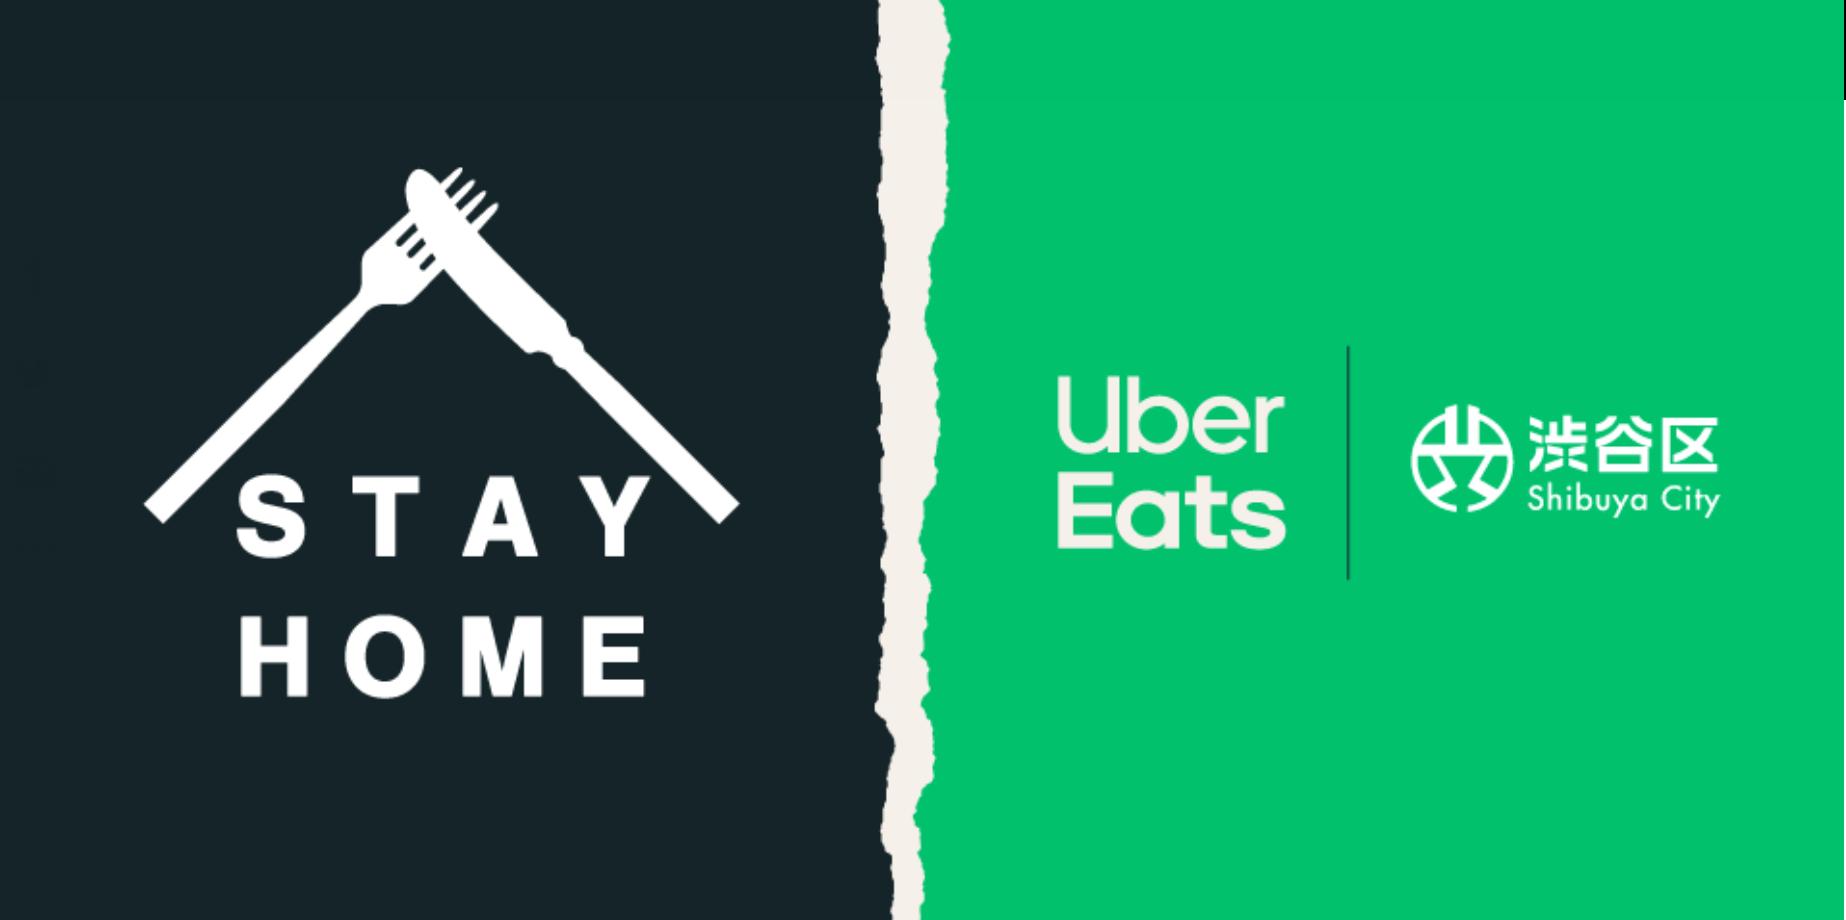 Uber Eats 渋谷区